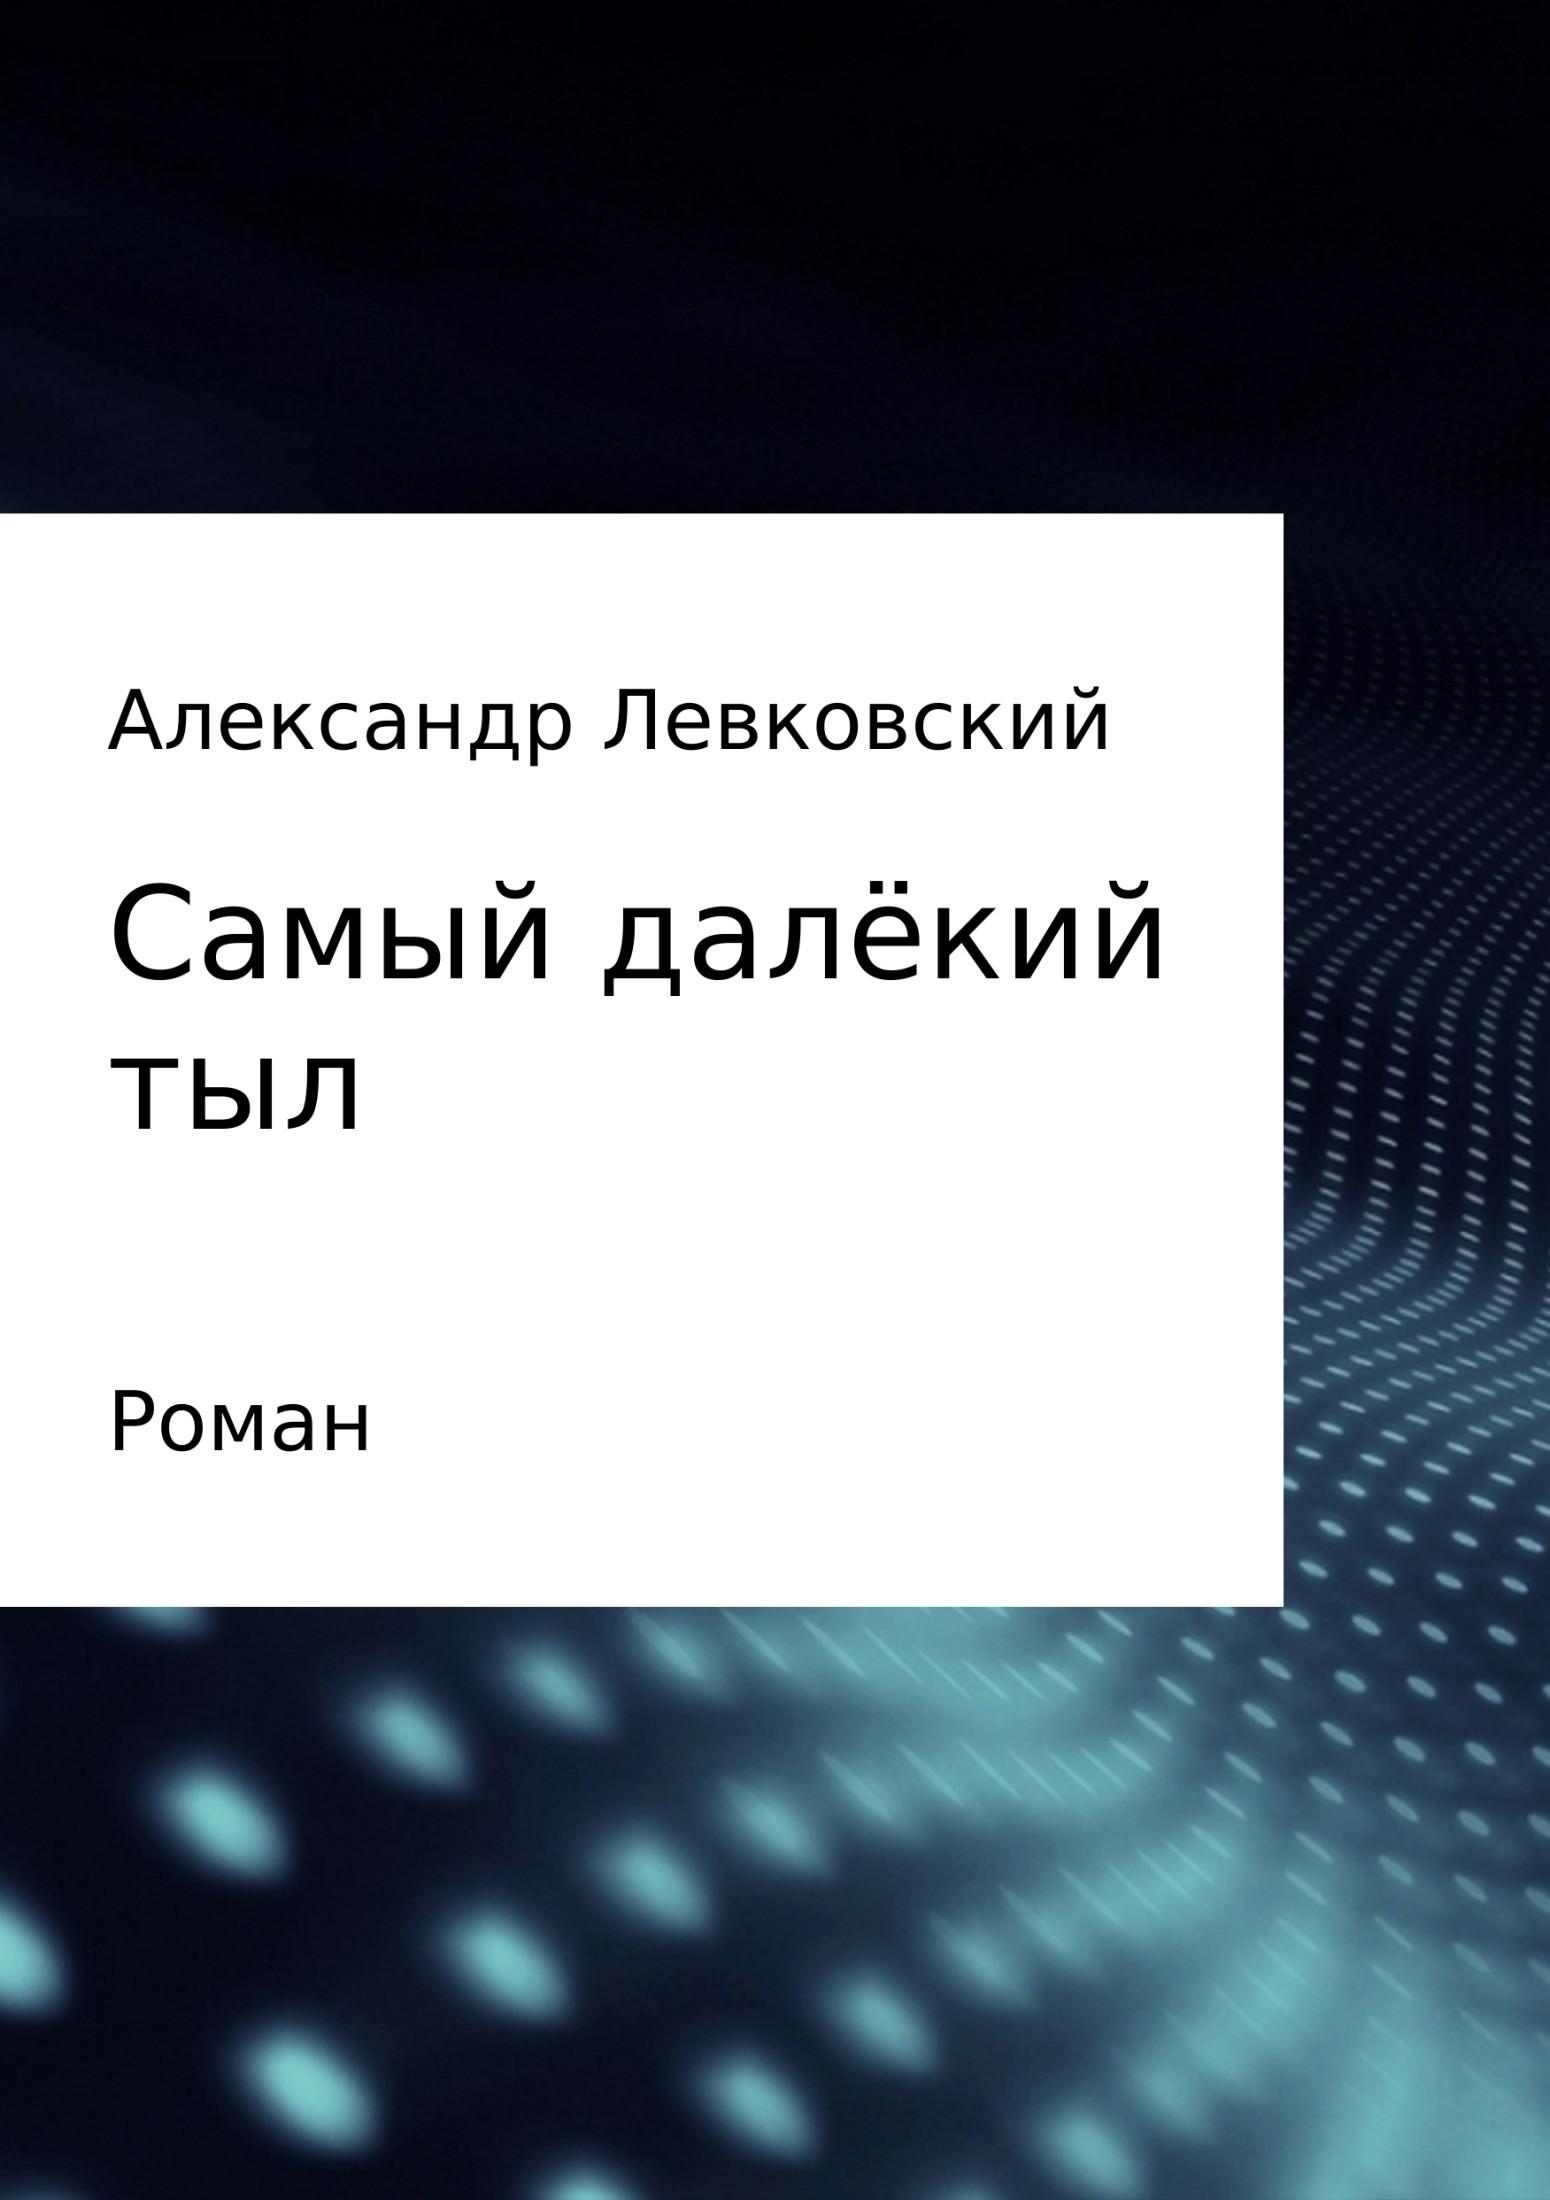 Александр Михайлович Левковский бесплатно